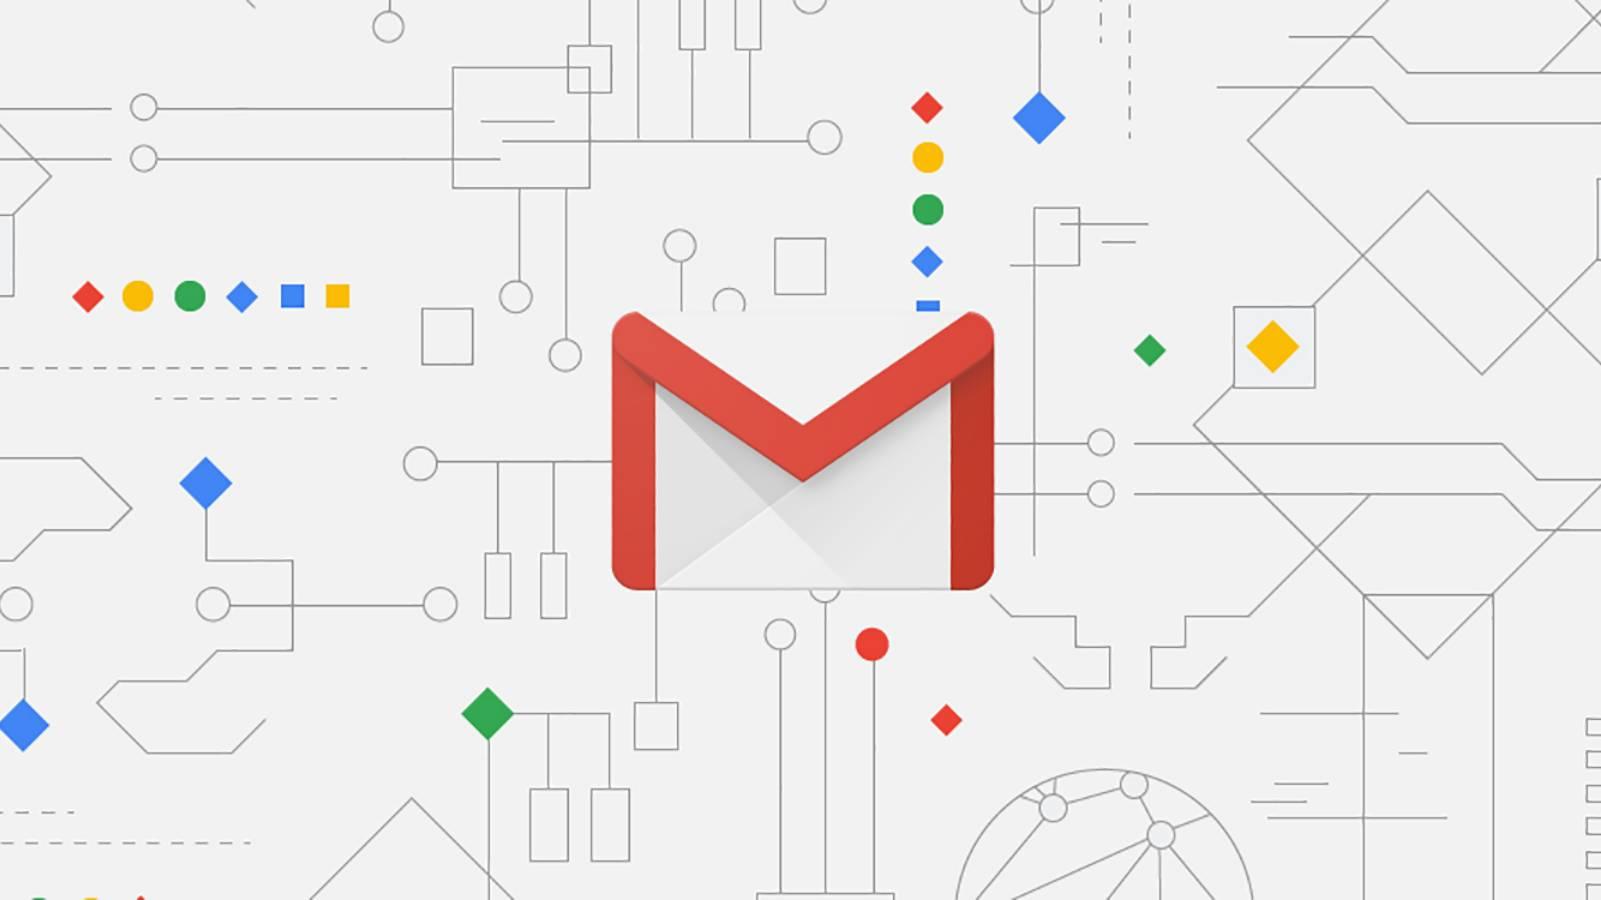 Gmail Update Nou Lansat pentru Telefoane si Tablete Azi